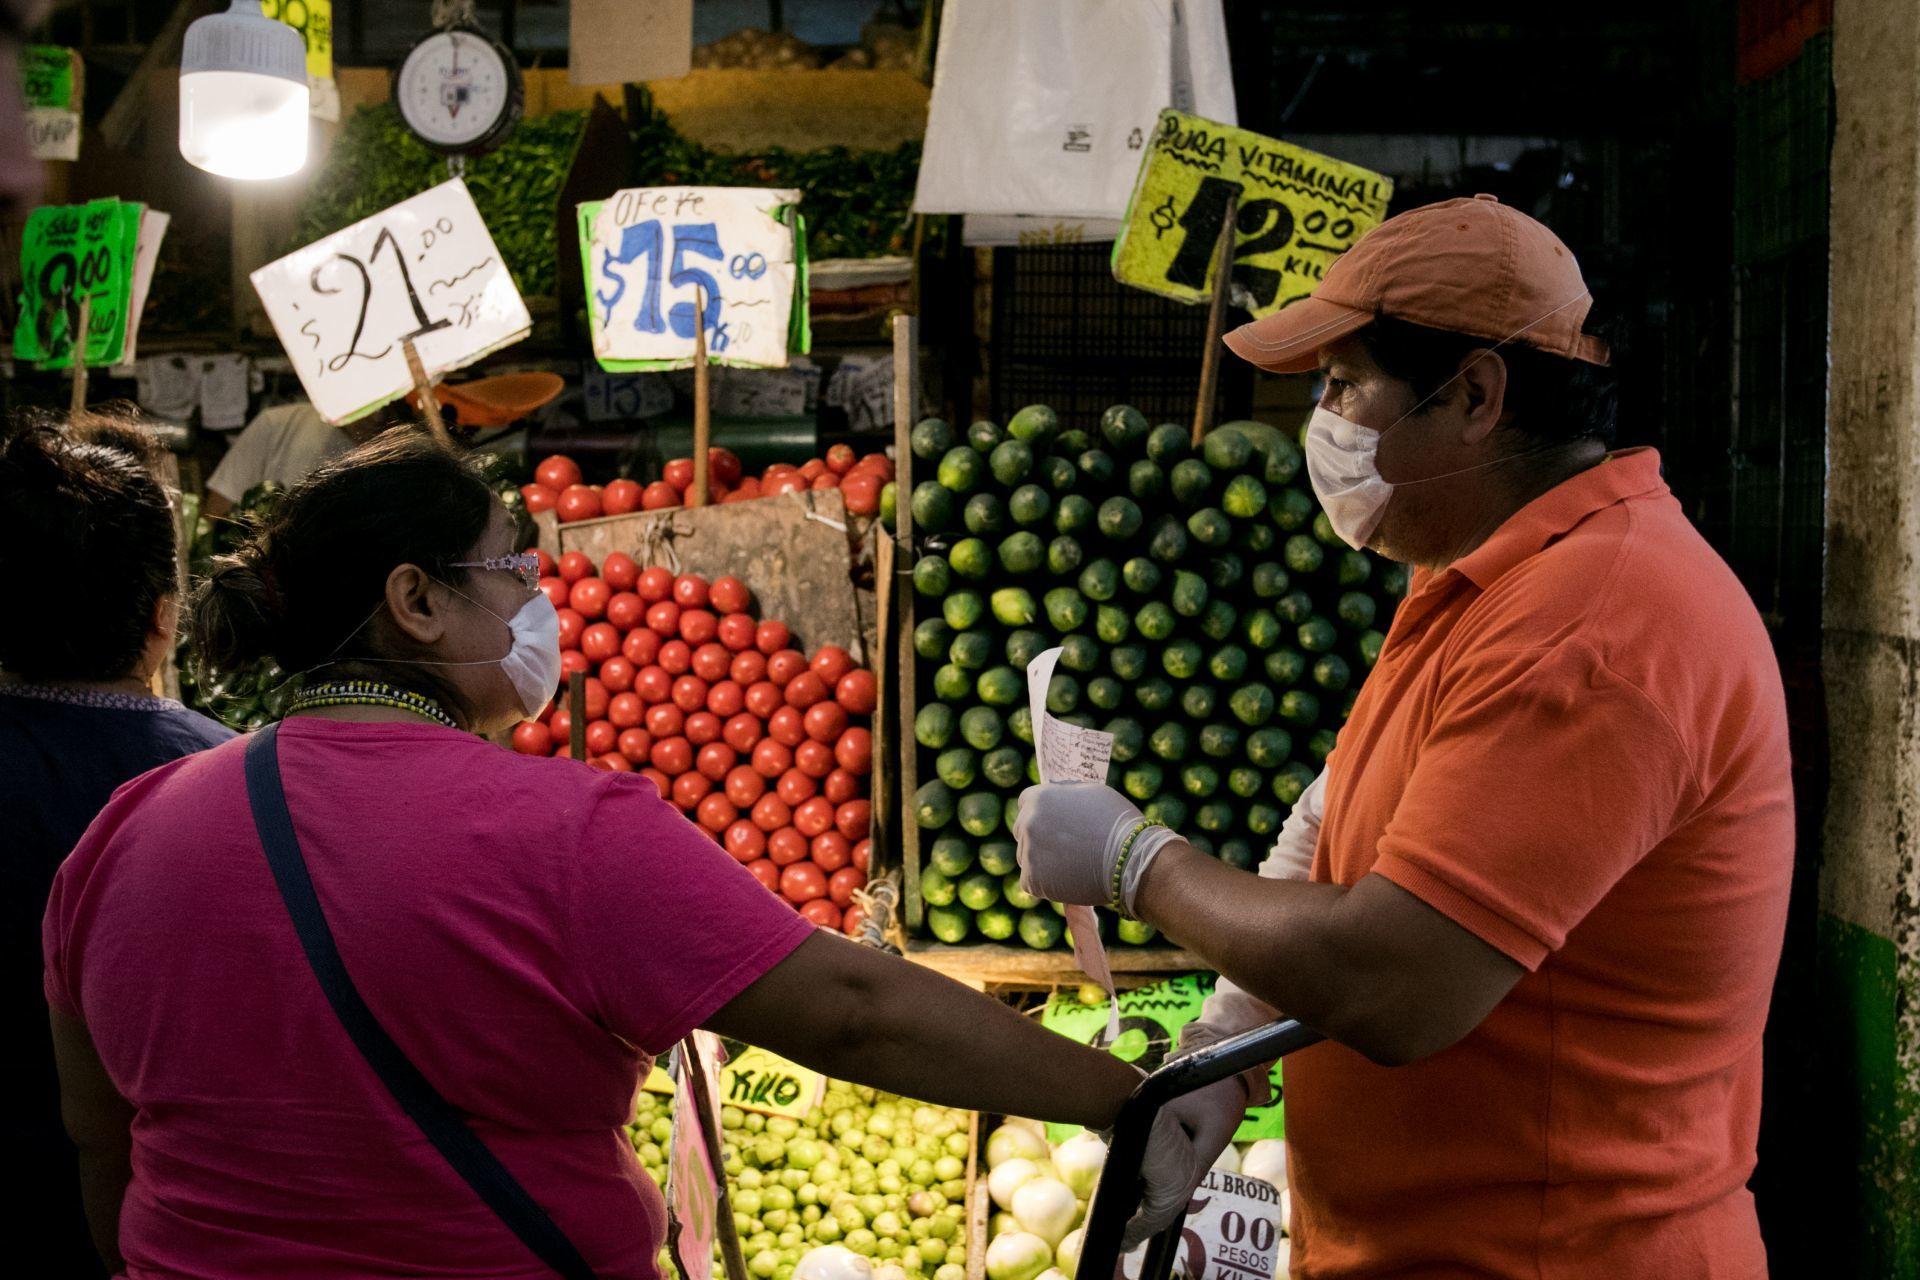 Coronavirus Mexico, Coronavirus en Mexico, Coronavirus Noticias, Comida, Mercados, Mercado, Supermercados, Supermercado, Alimentos, Sana Distancia, Coronavirus, Covid, Ciudad de México, 25 de marzo 2020